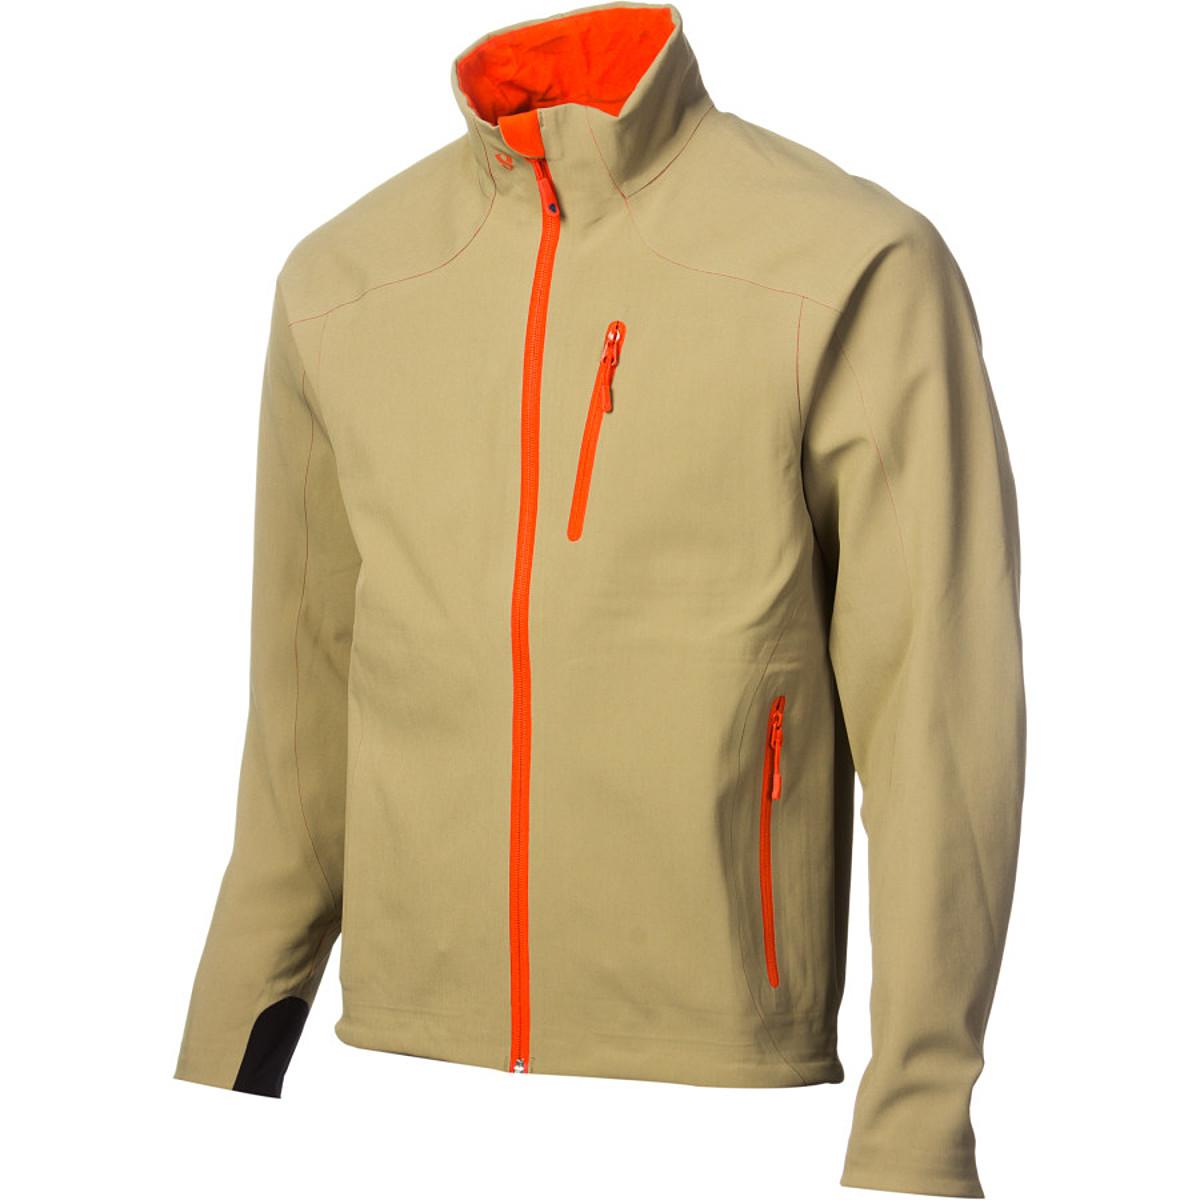 Stoic Monolith Softshell Jacket